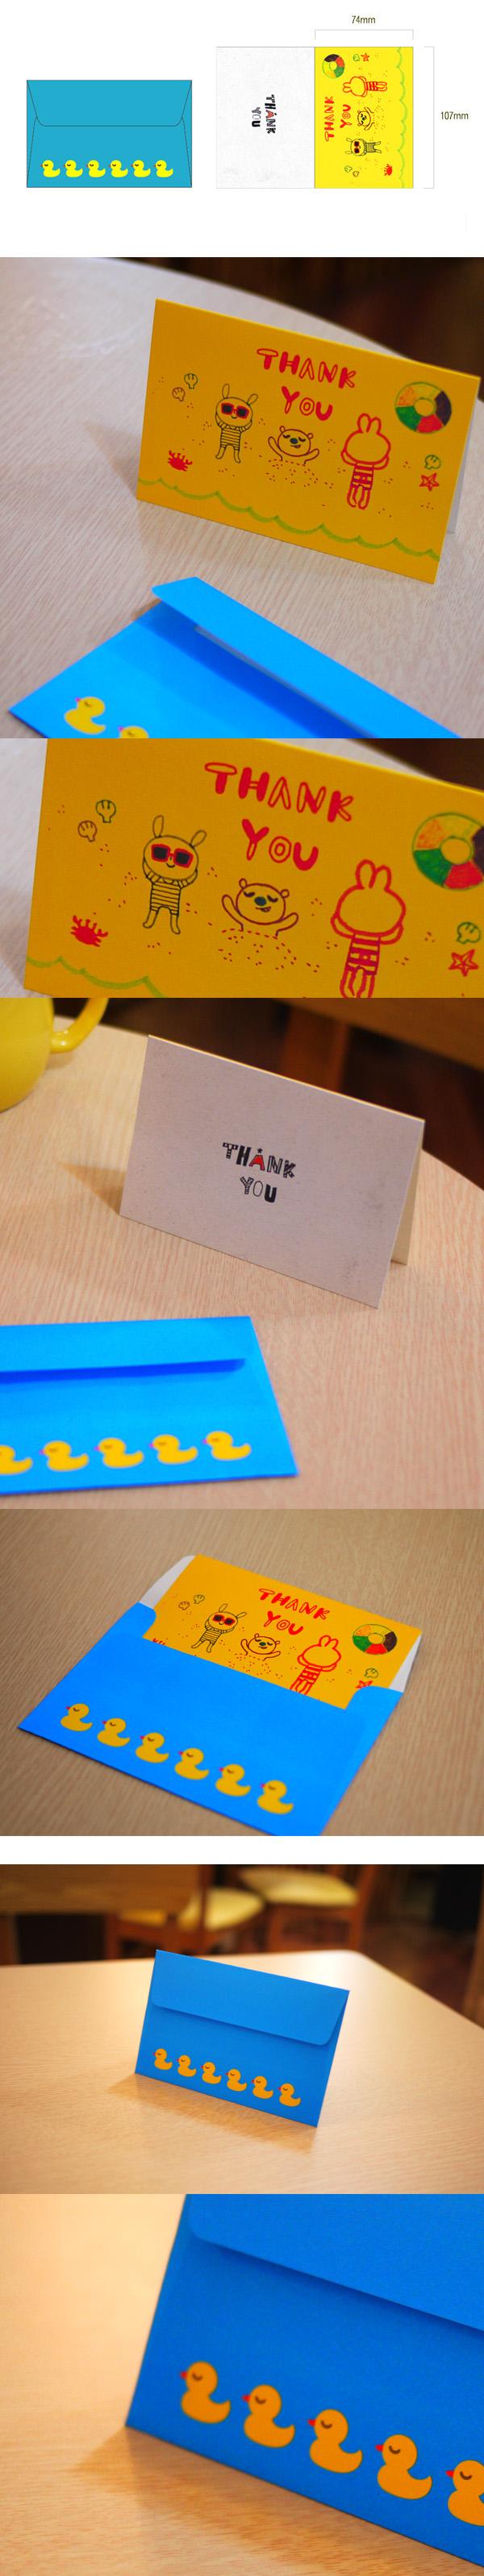 For You 카드 002 - 밀로, 700원, 카드, 감사 카드